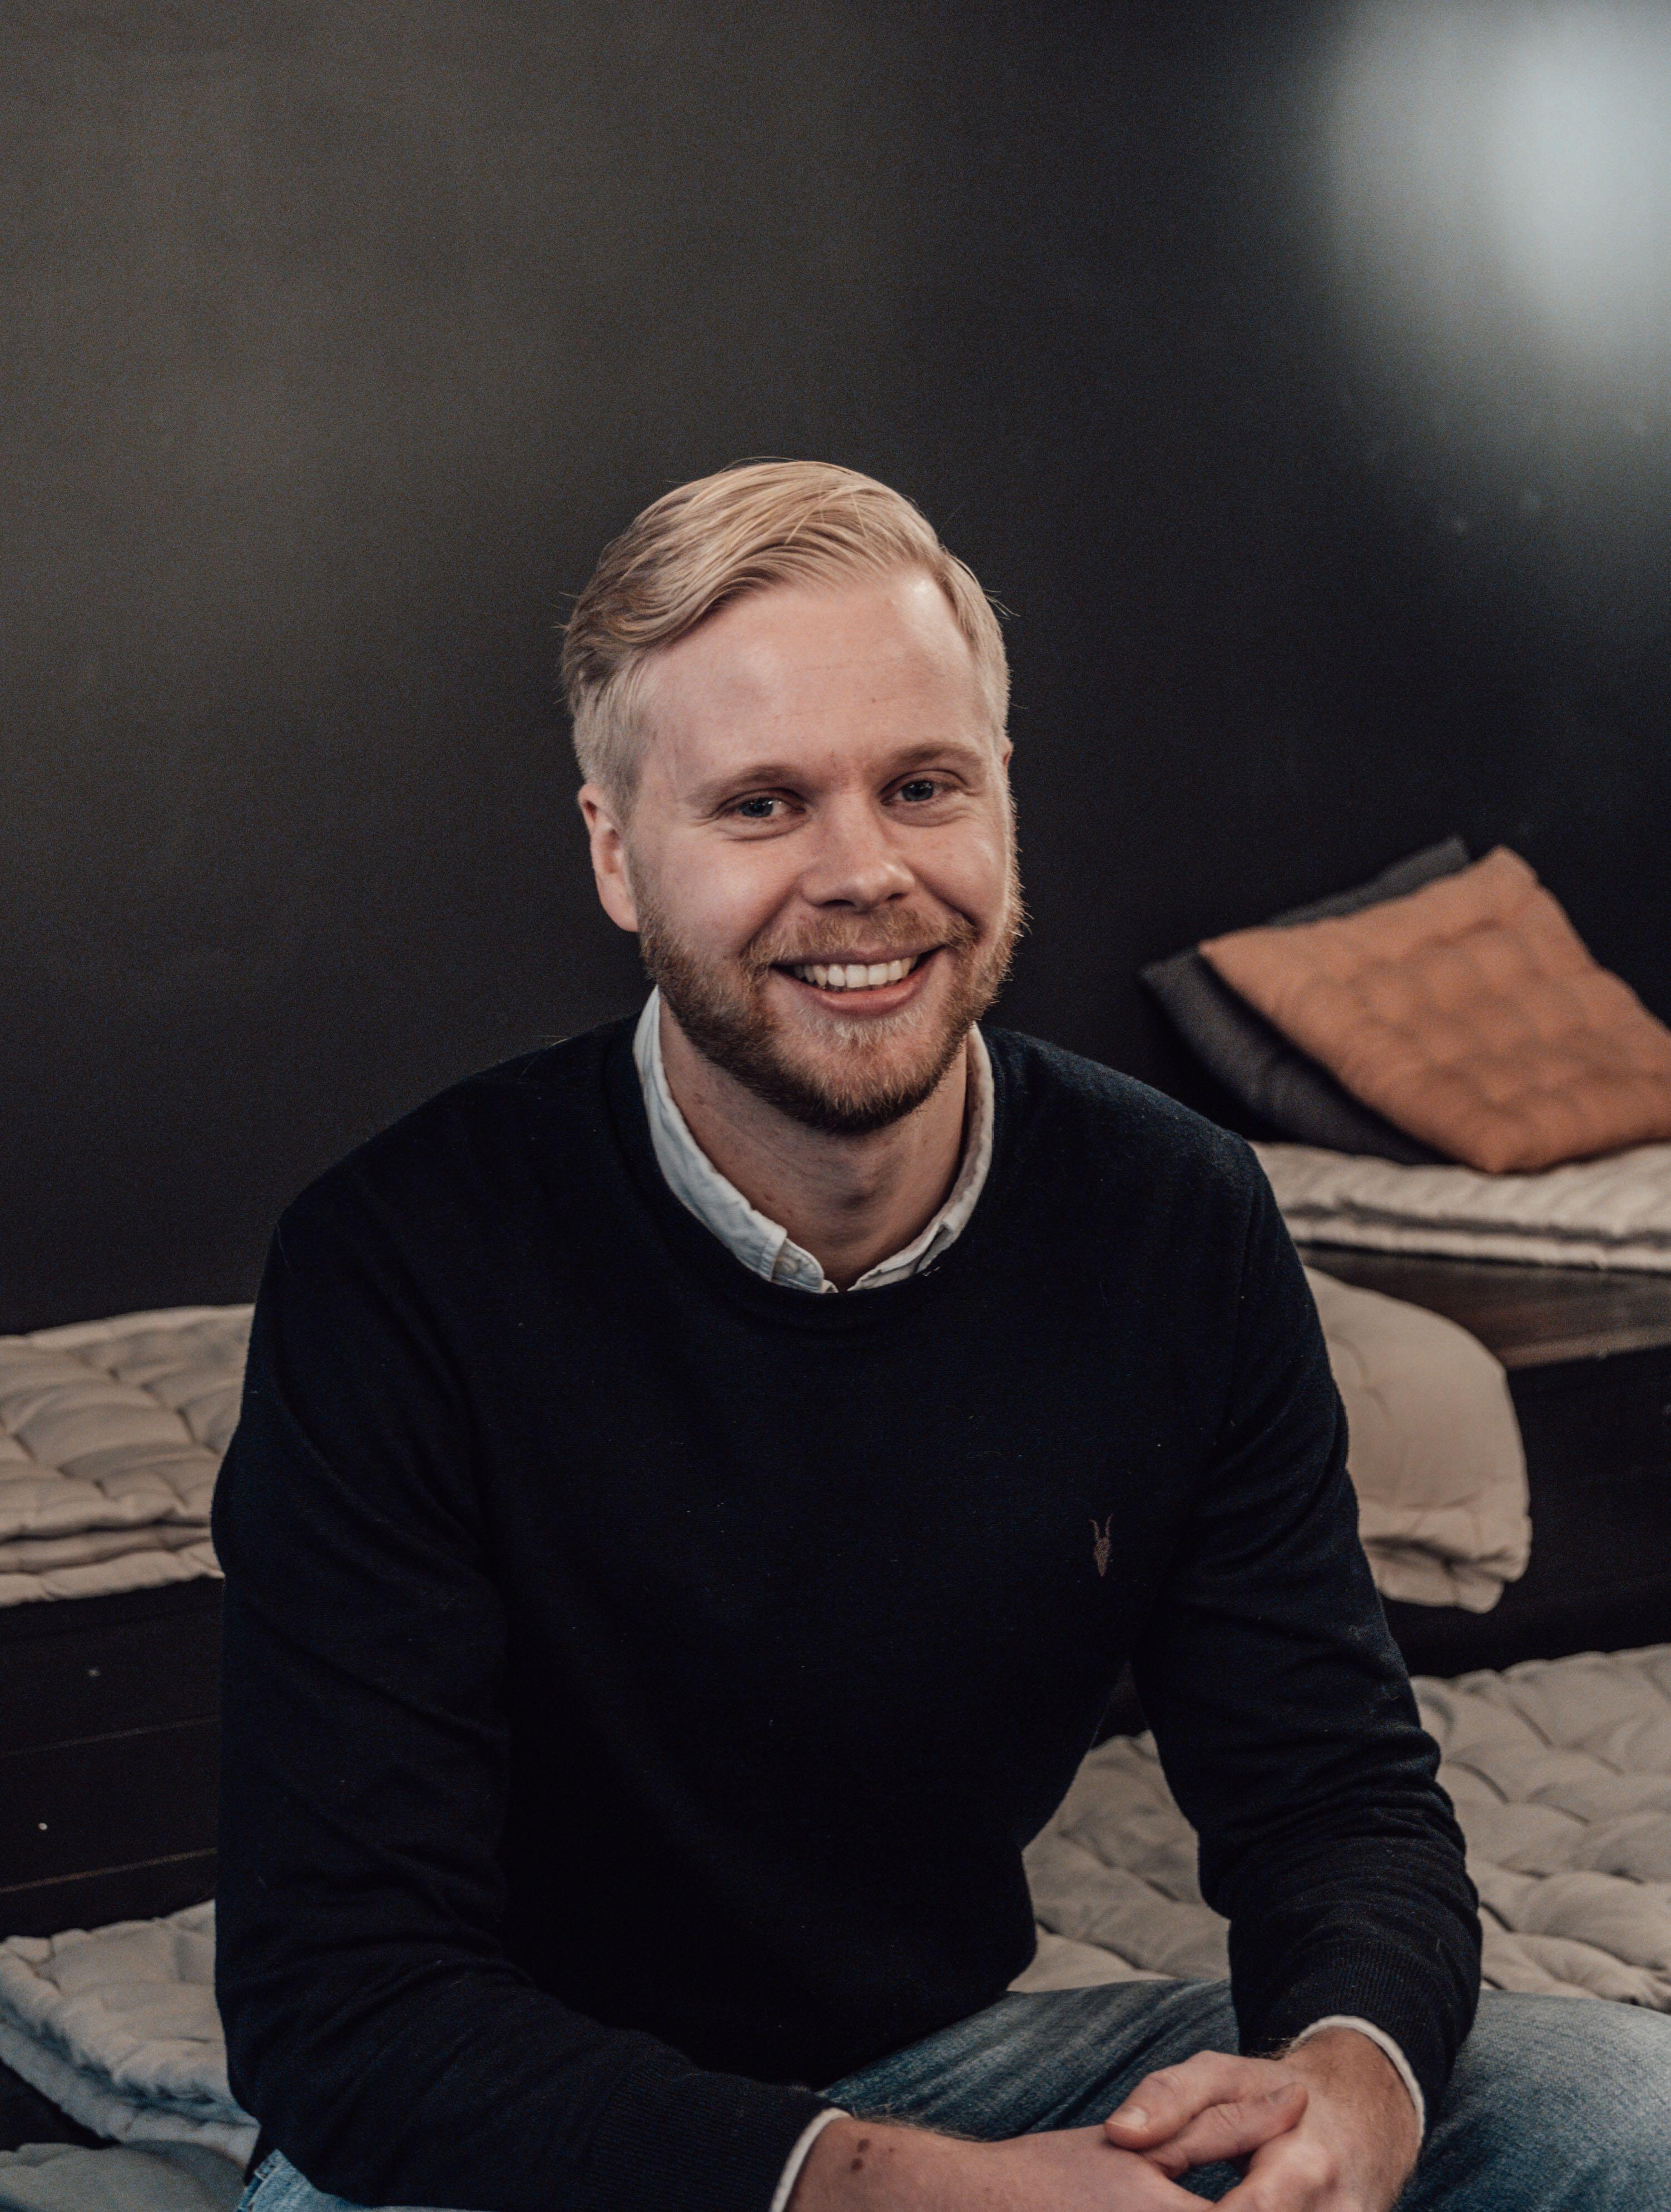 Eemeli Metsäntähti joins Coventures as an Entrepreneur in Residence